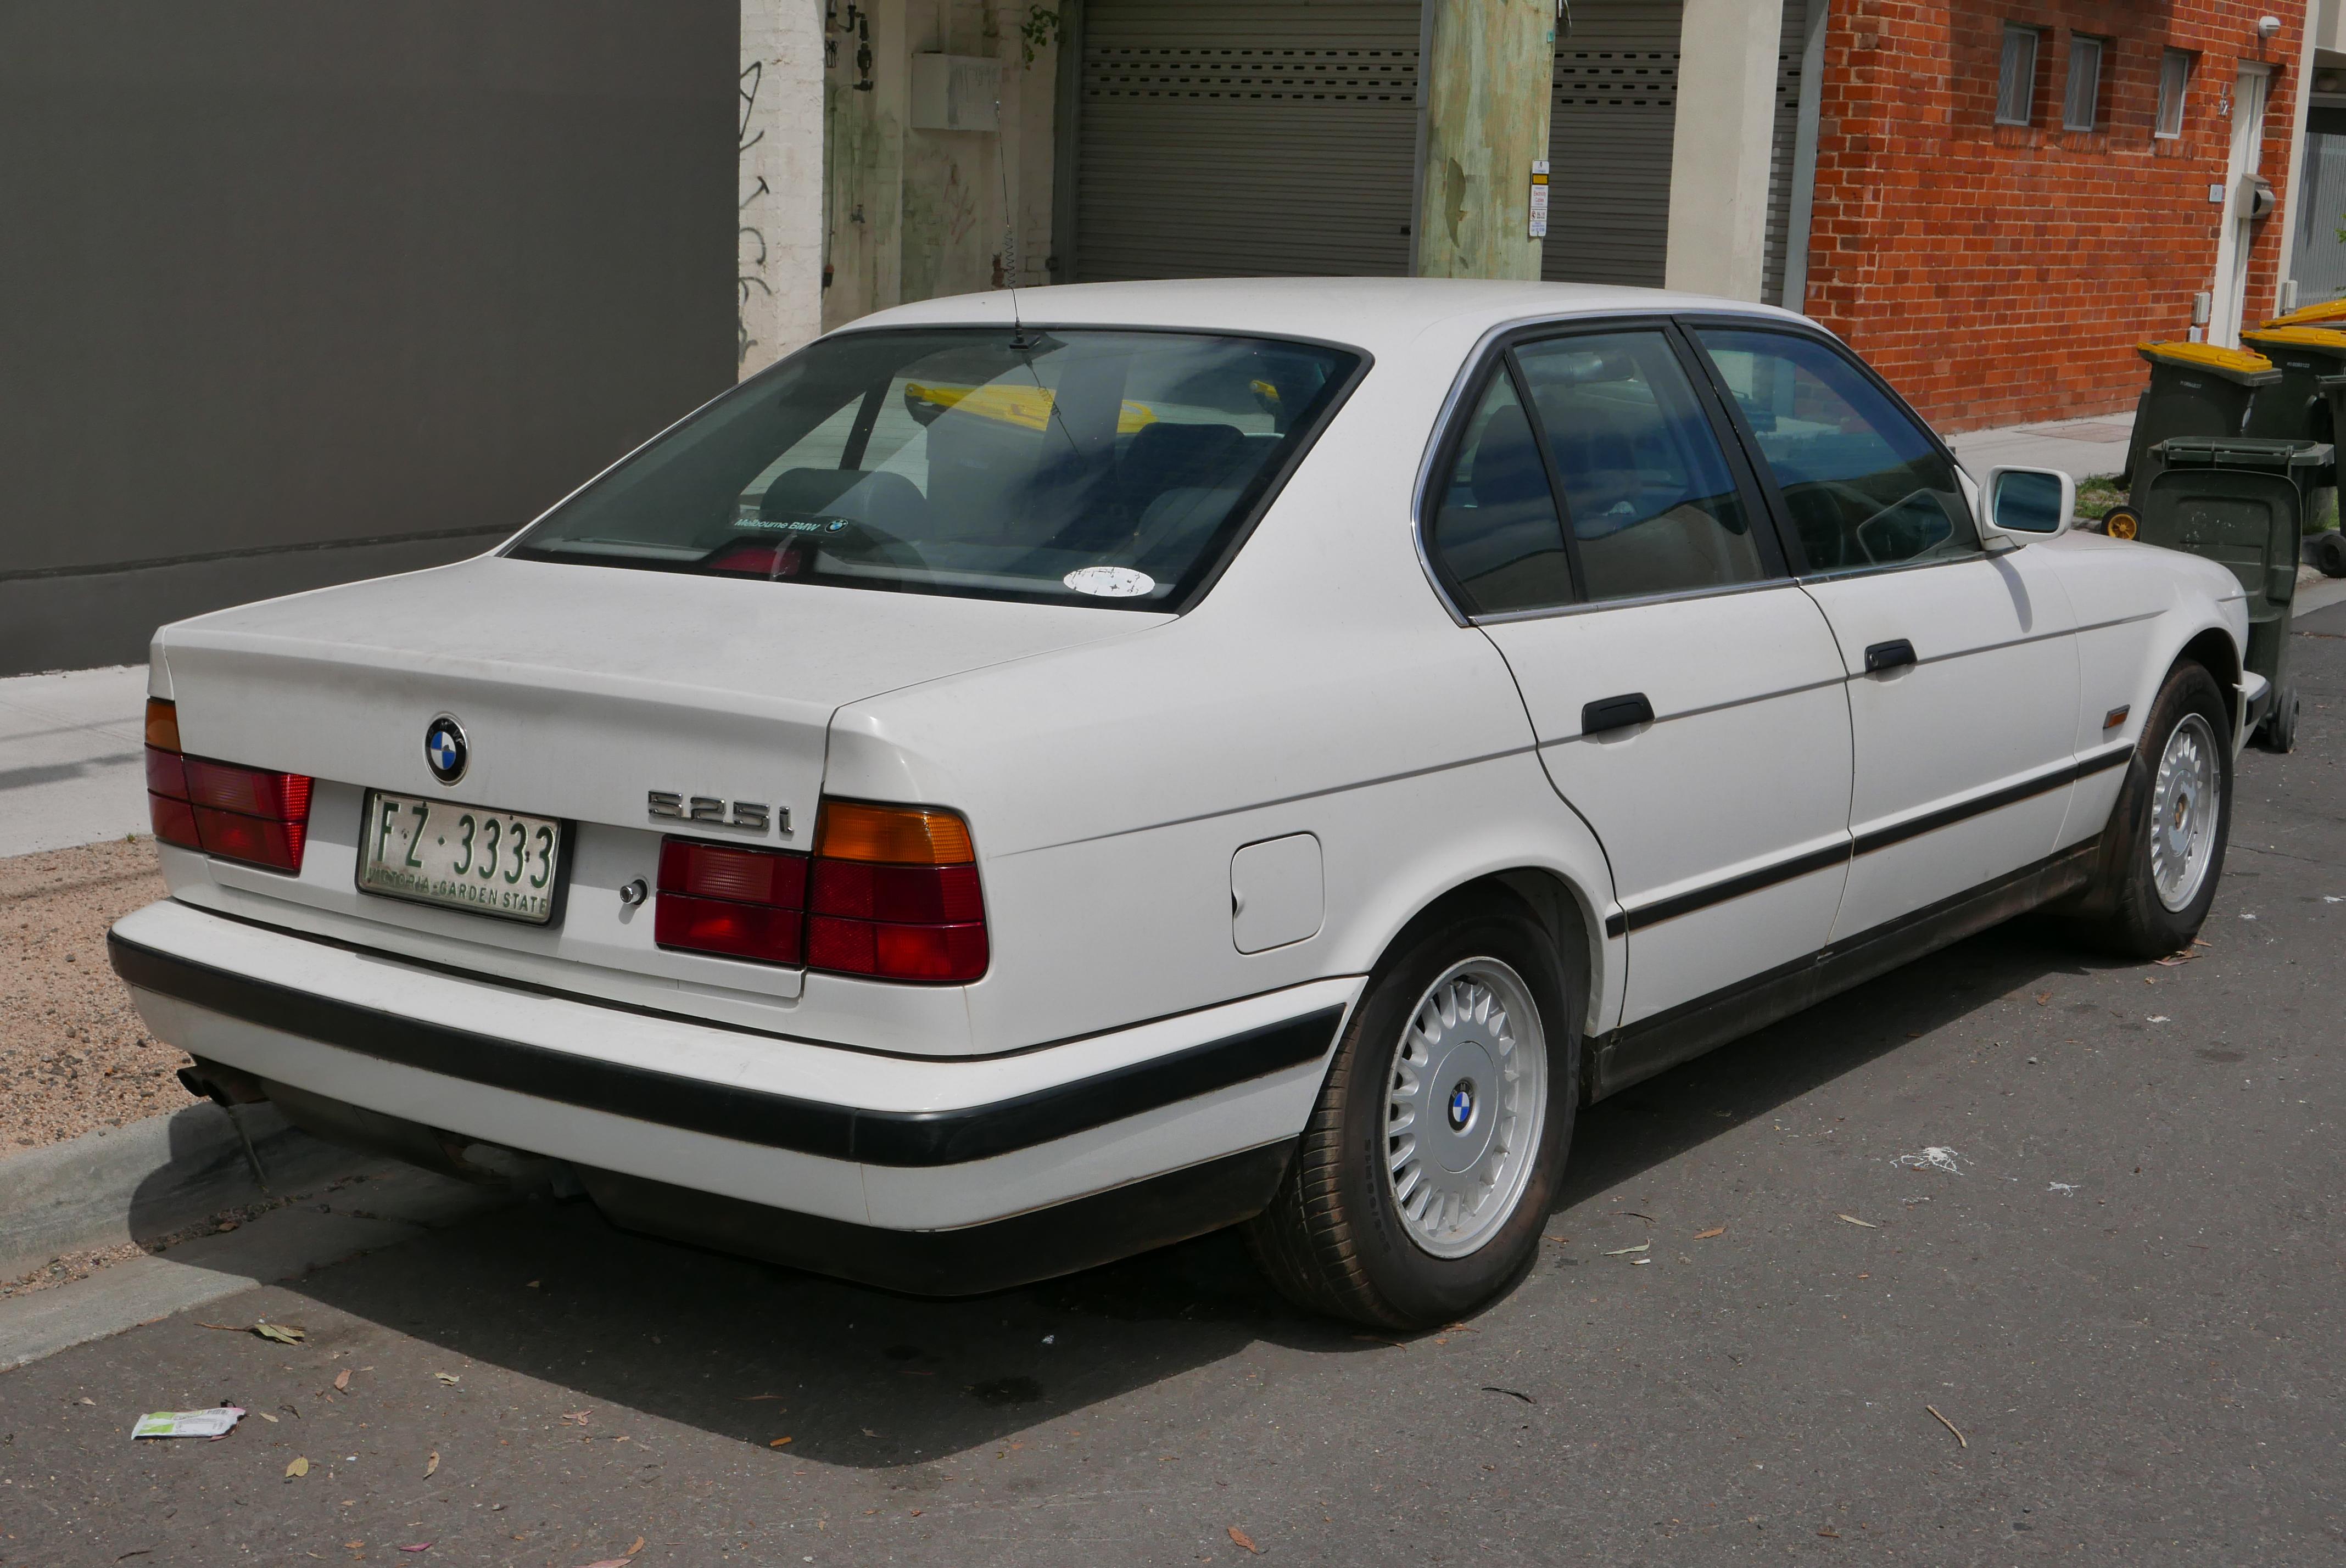 file:1989 bmw 525i (e34) sedan (2015-11-13) 02 - wikimedia commons